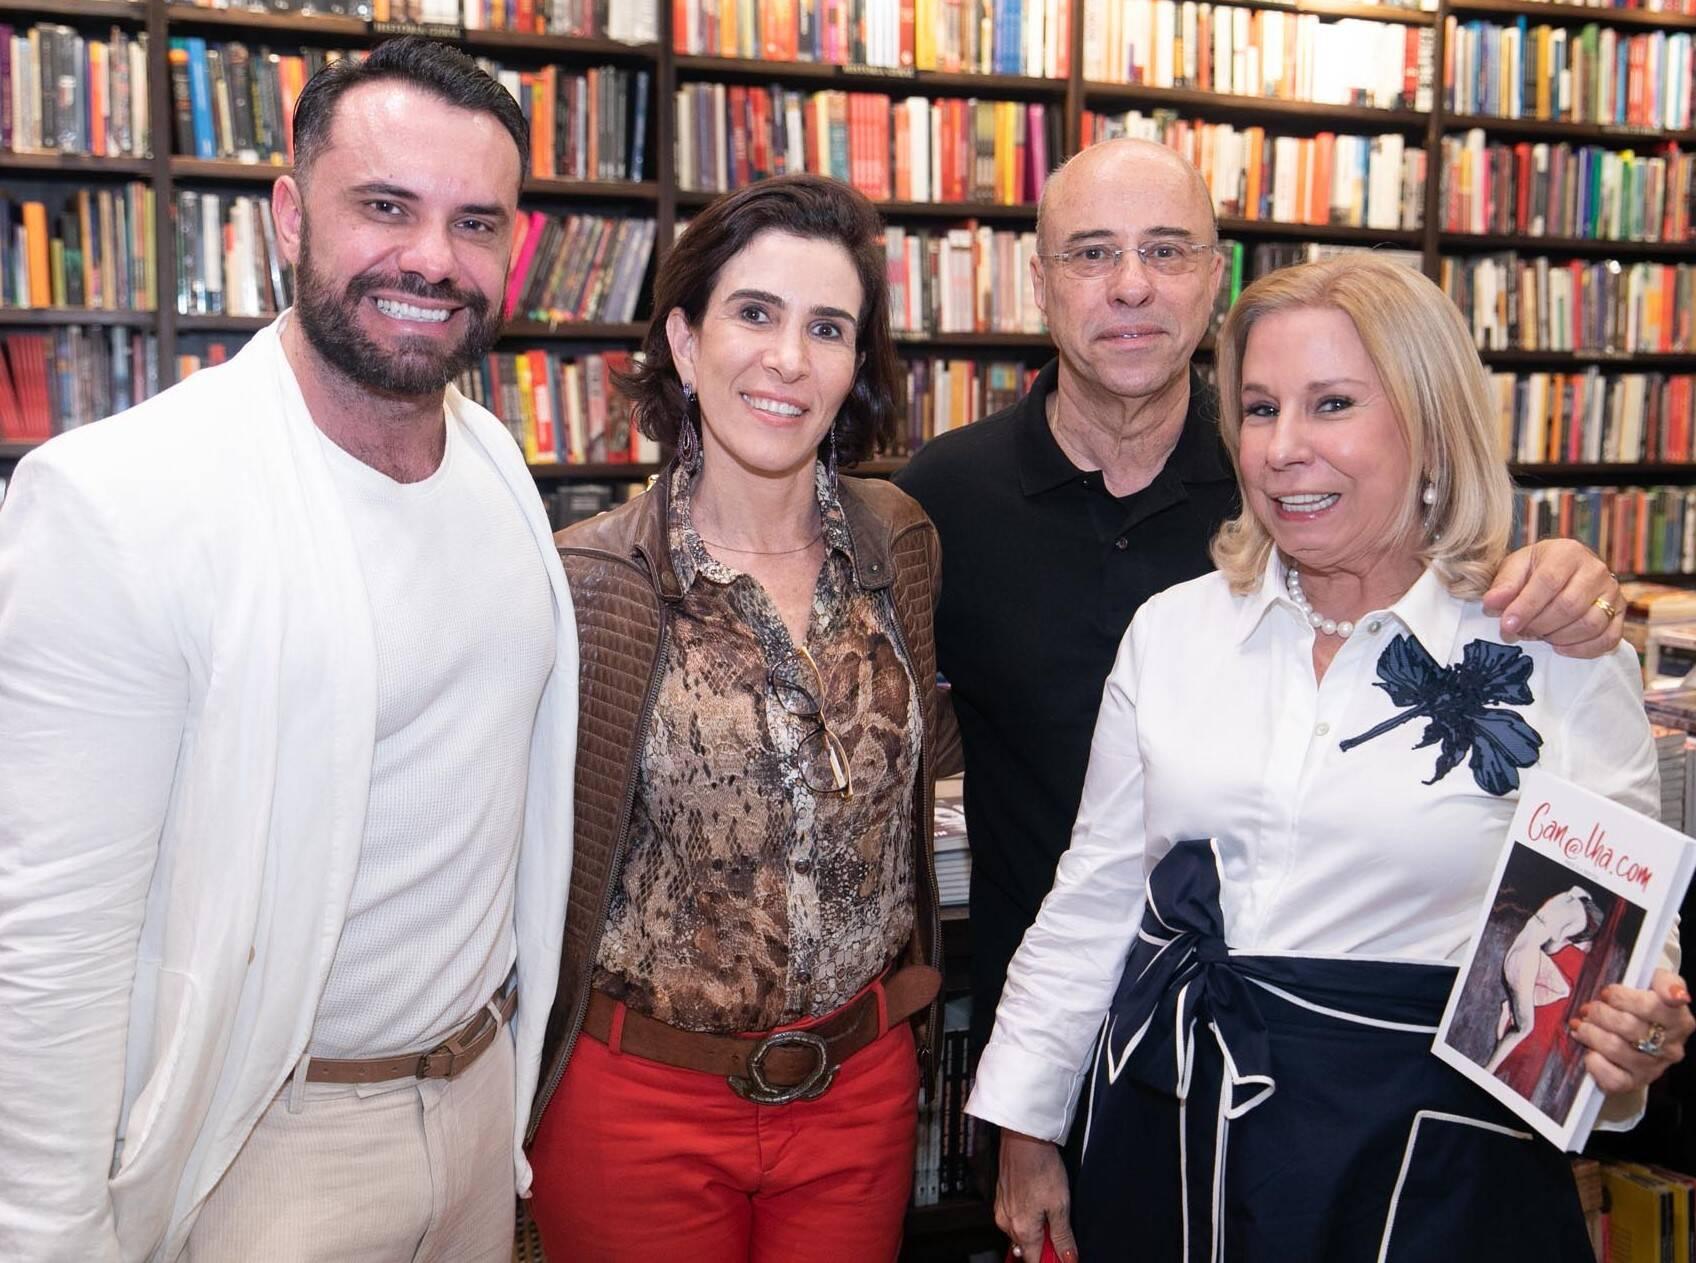 Eduardo Santos, Esther Nigri, Lucio Lage e Vivi Cohen  /Foto: Miguel Sá